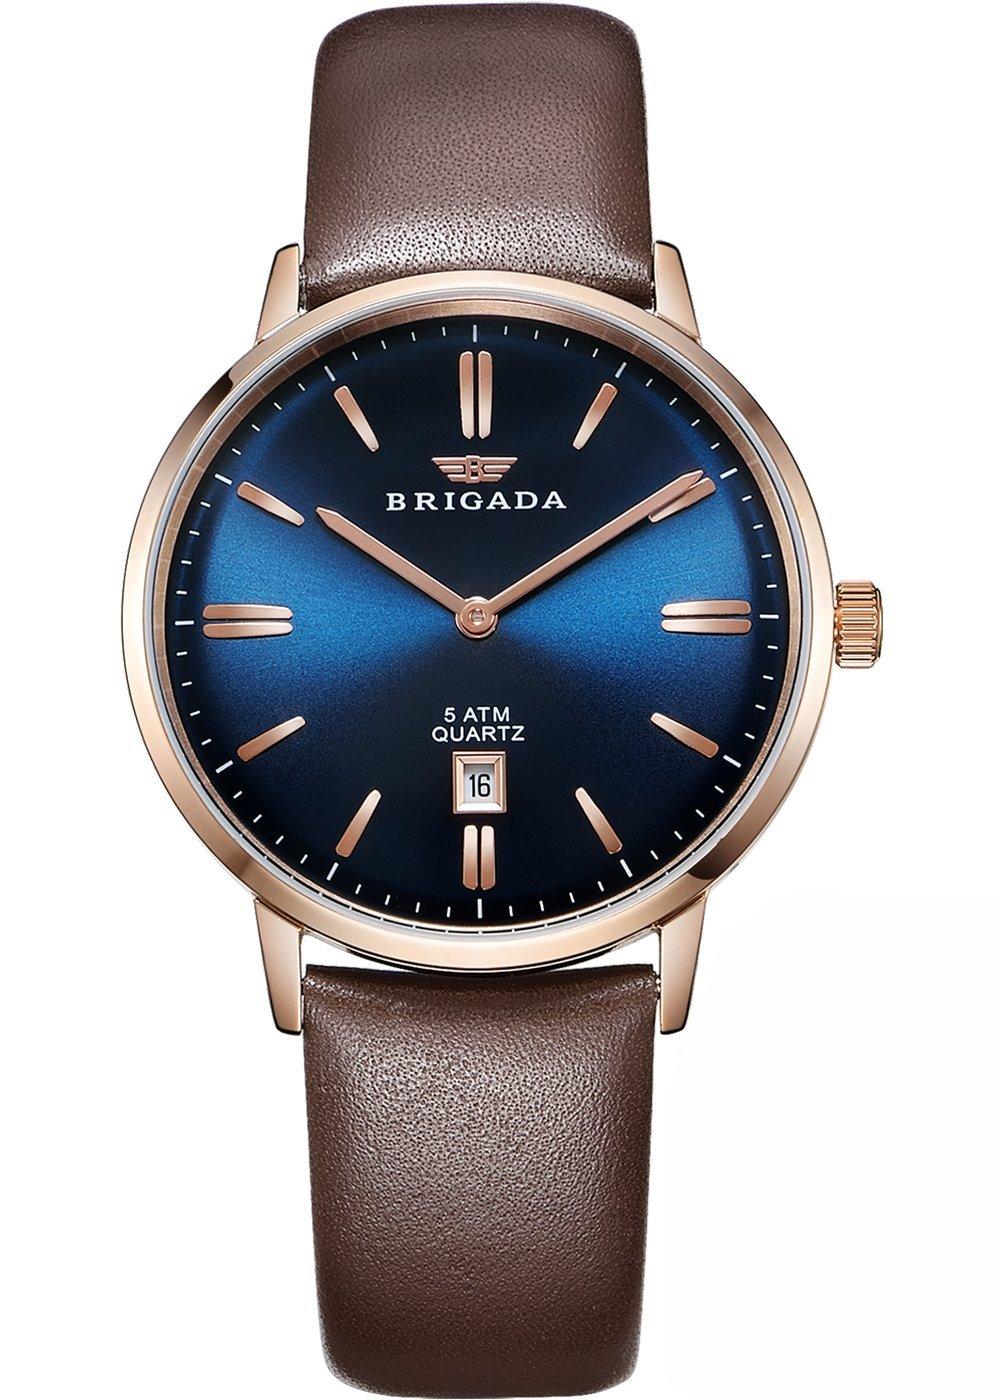 BRIGADA メンズ 腕時計 コーヒー色 ベルト 本革 大人 クオーツ ビジネス シンプル 時計 [並行輸入品]